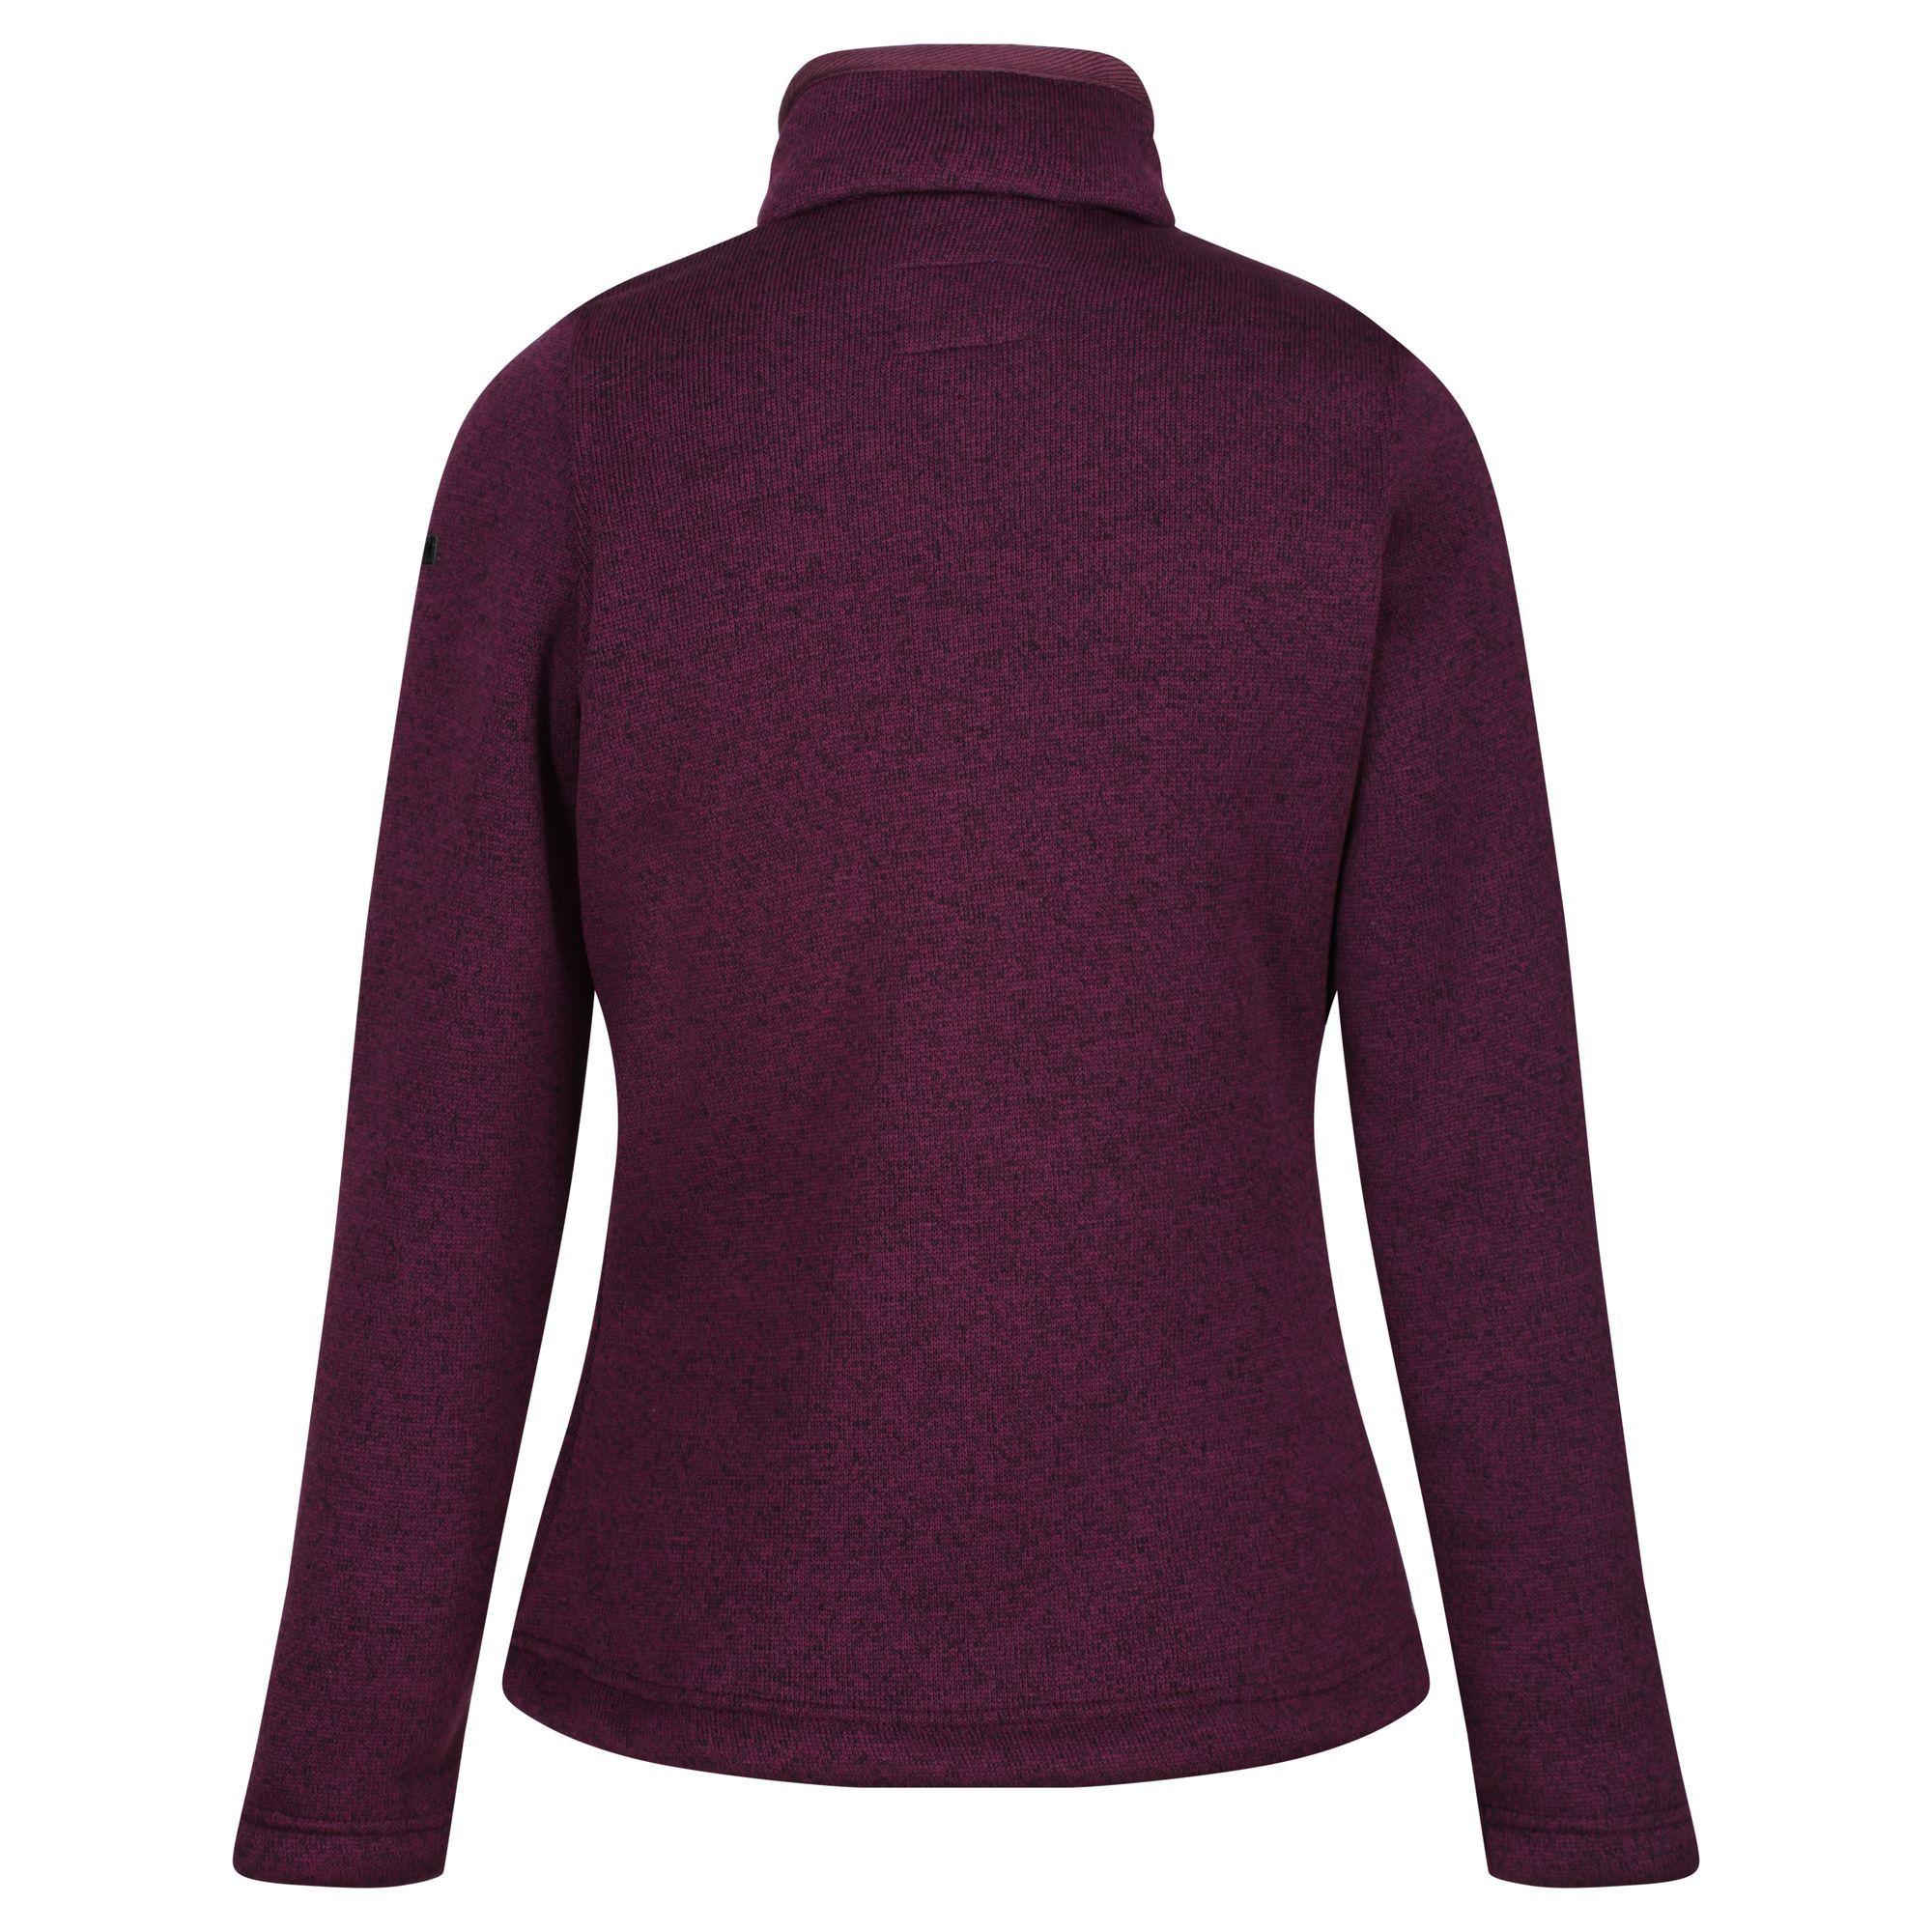 Regatta Womens/Ladies Raizel Full Zip Fleece